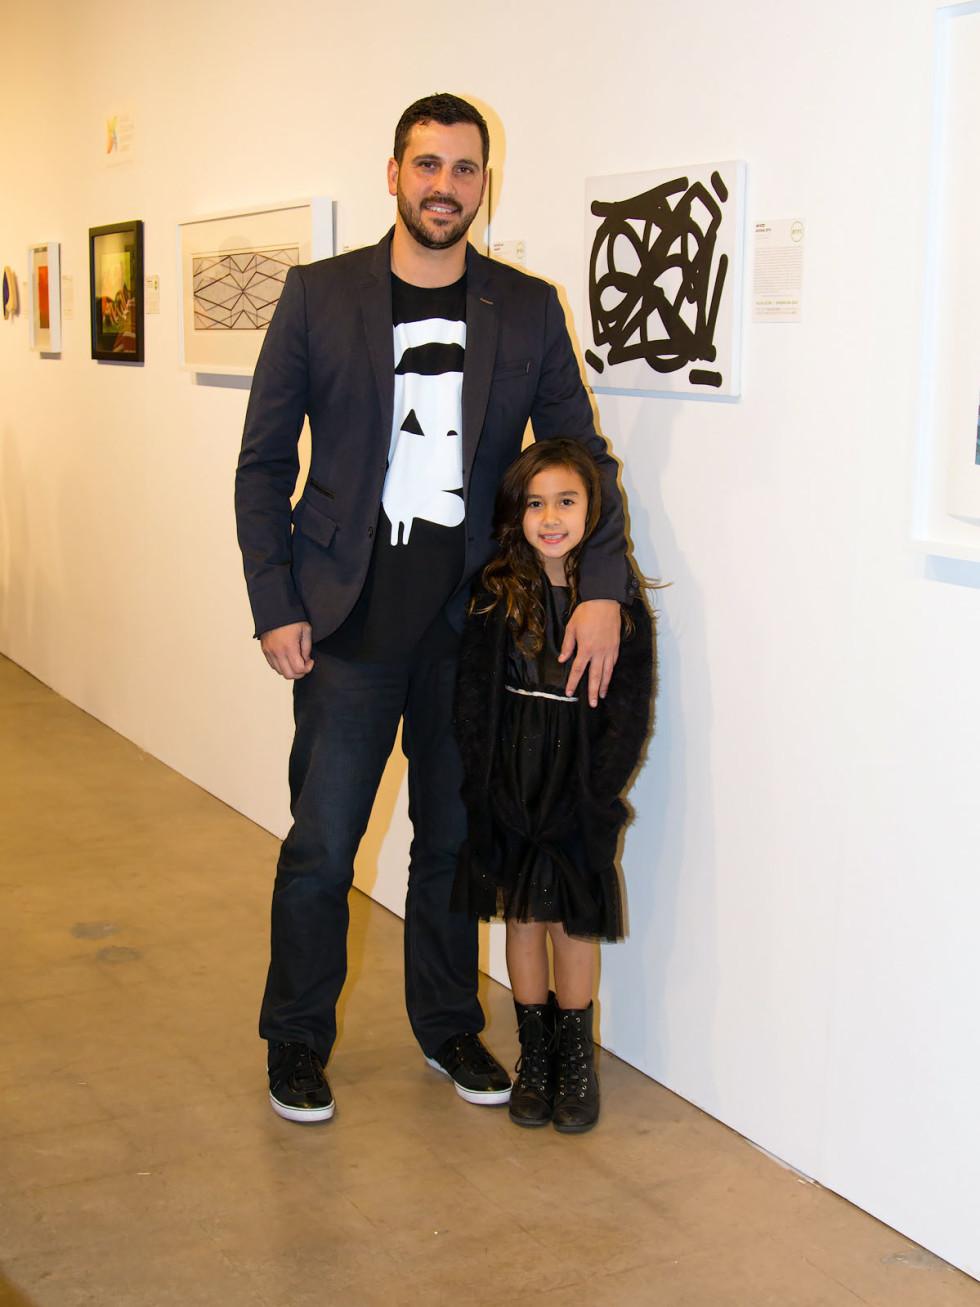 James RIzzi and Mia